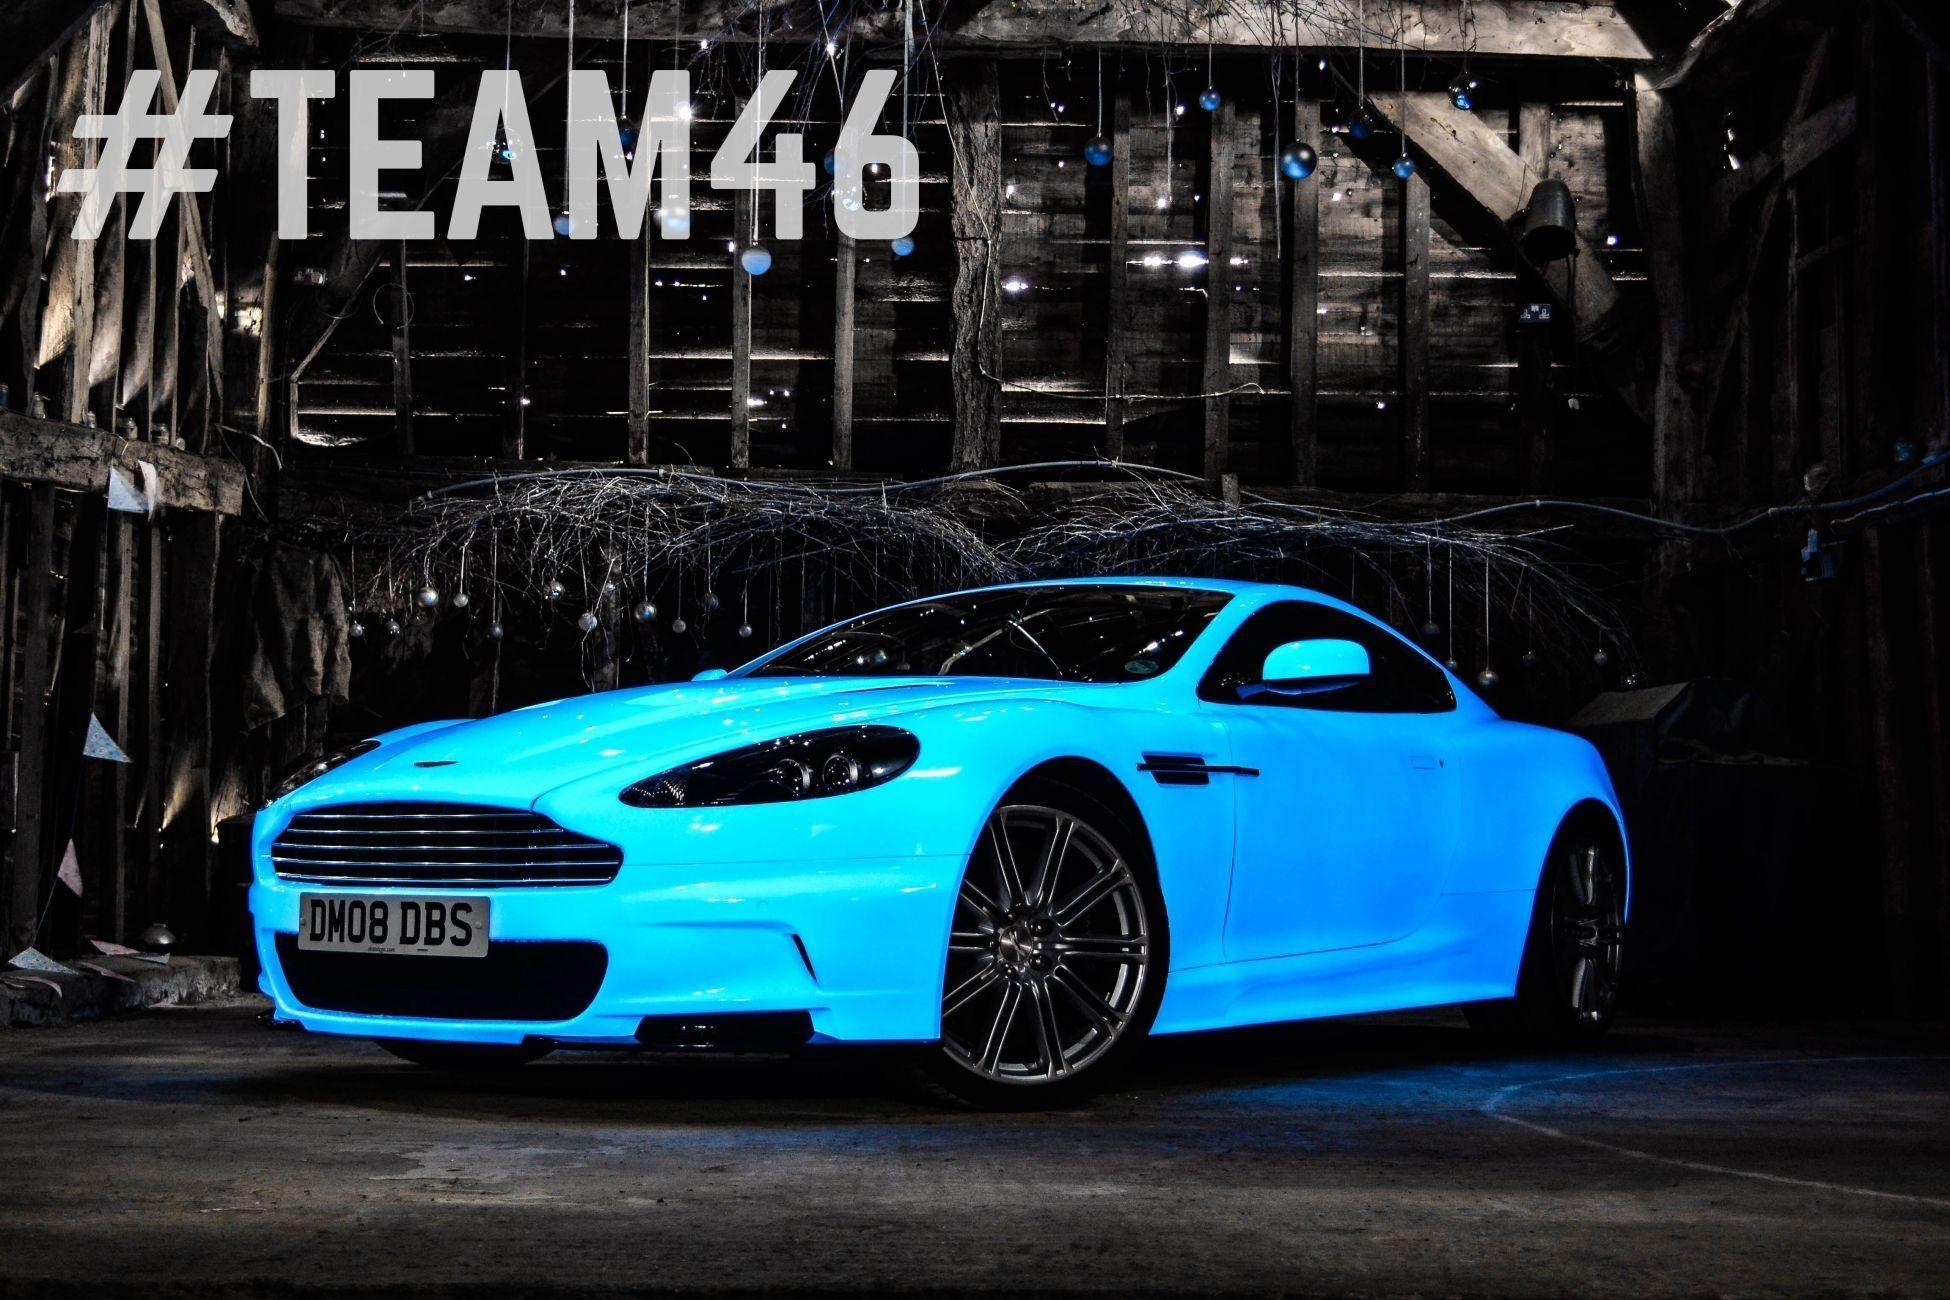 Gumball 3000 Aston Martin Sports New Glow In The Dark Paint